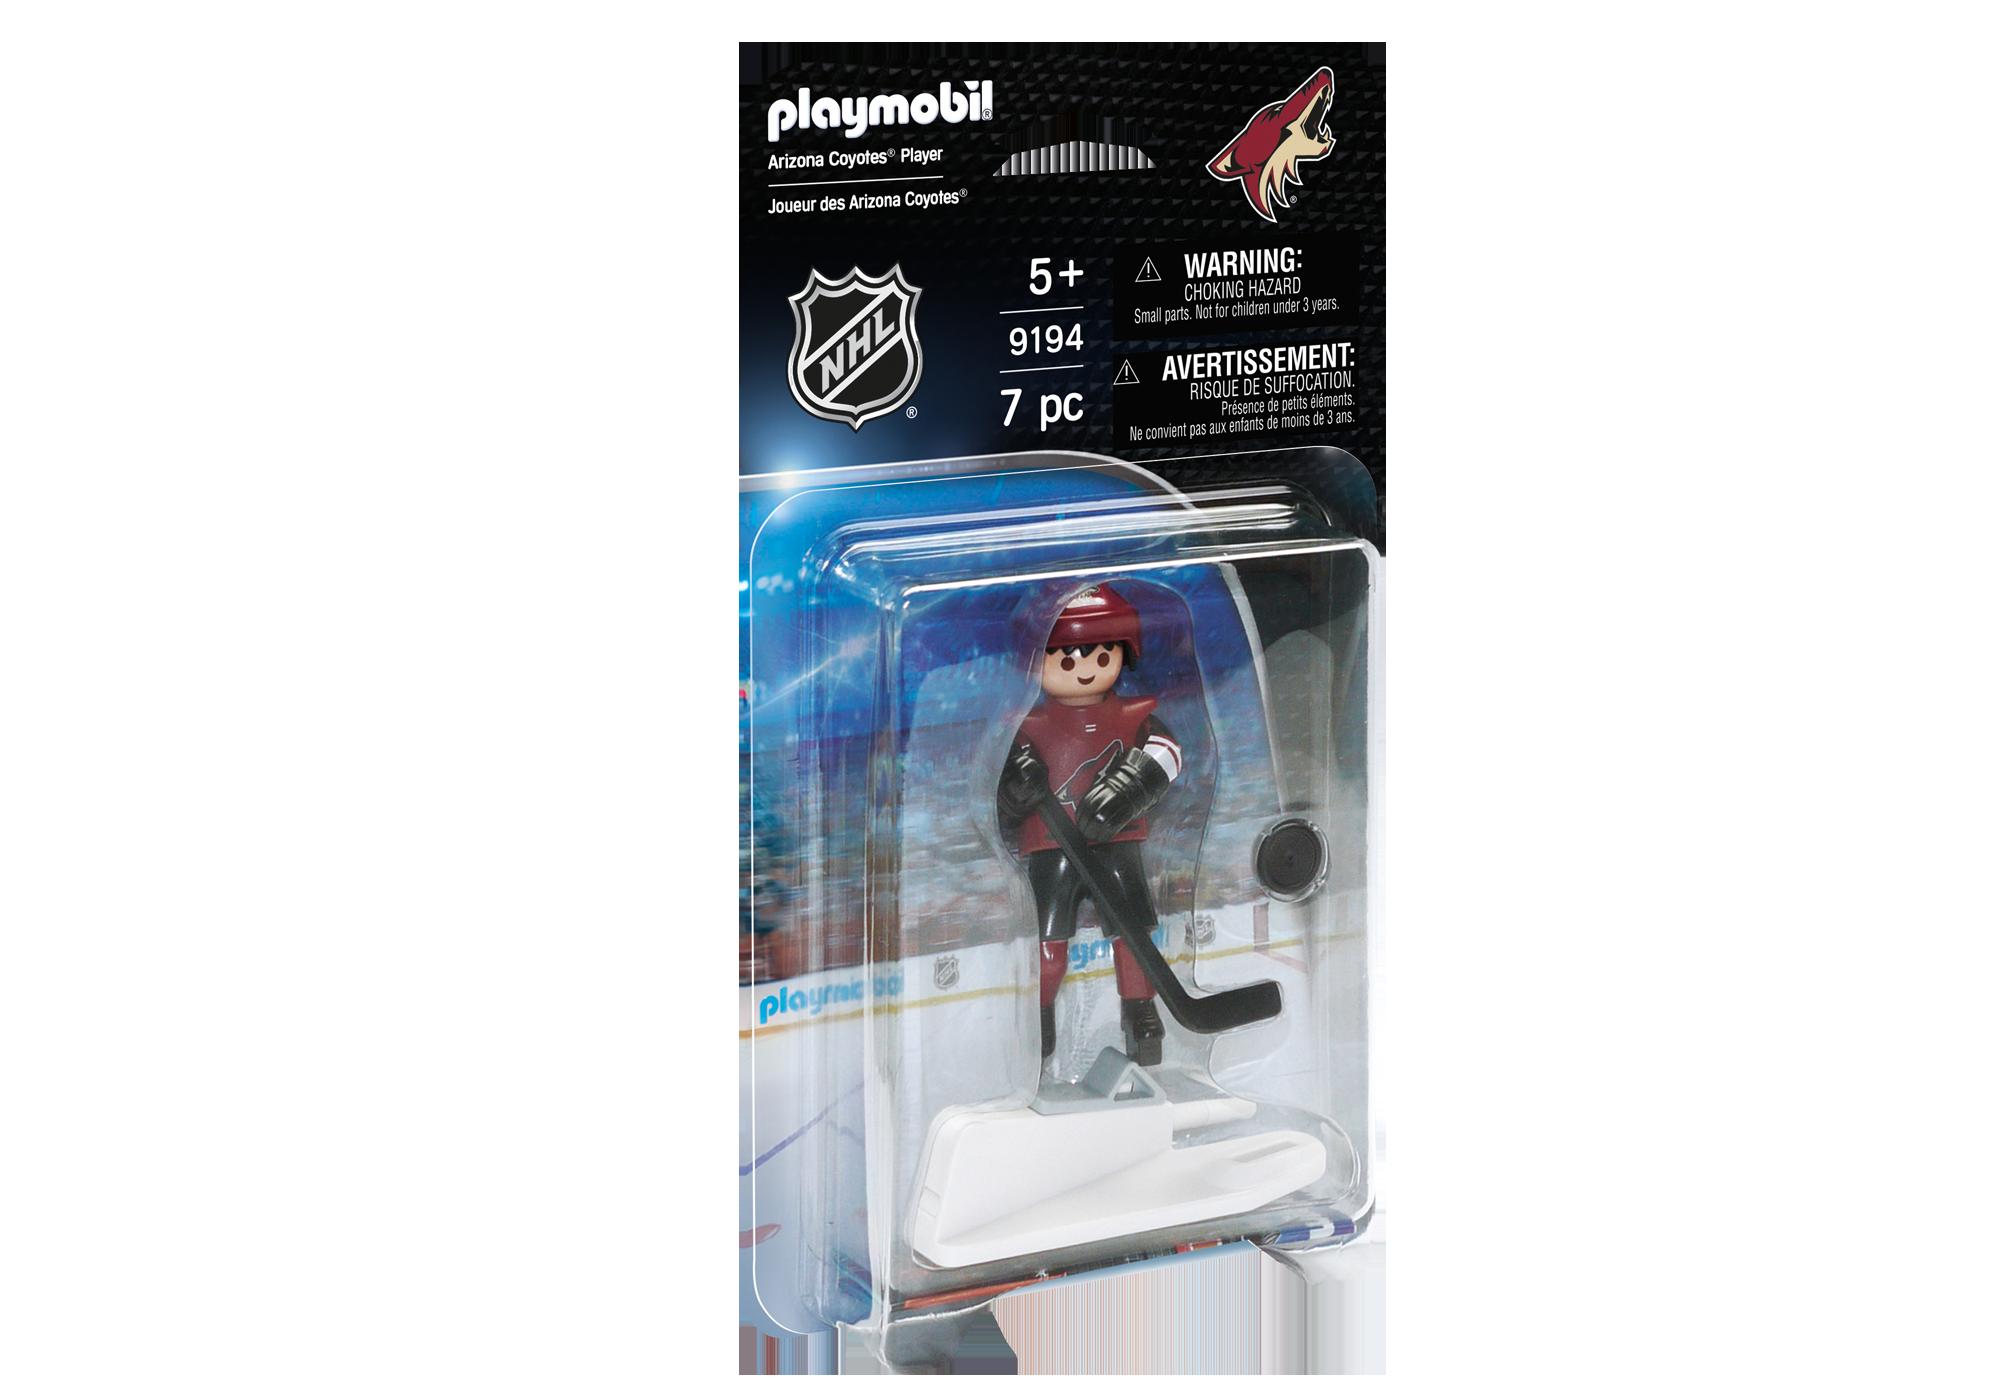 http://media.playmobil.com/i/playmobil/9194_product_box_front/NHL™ Arizona Coyotes™ Player